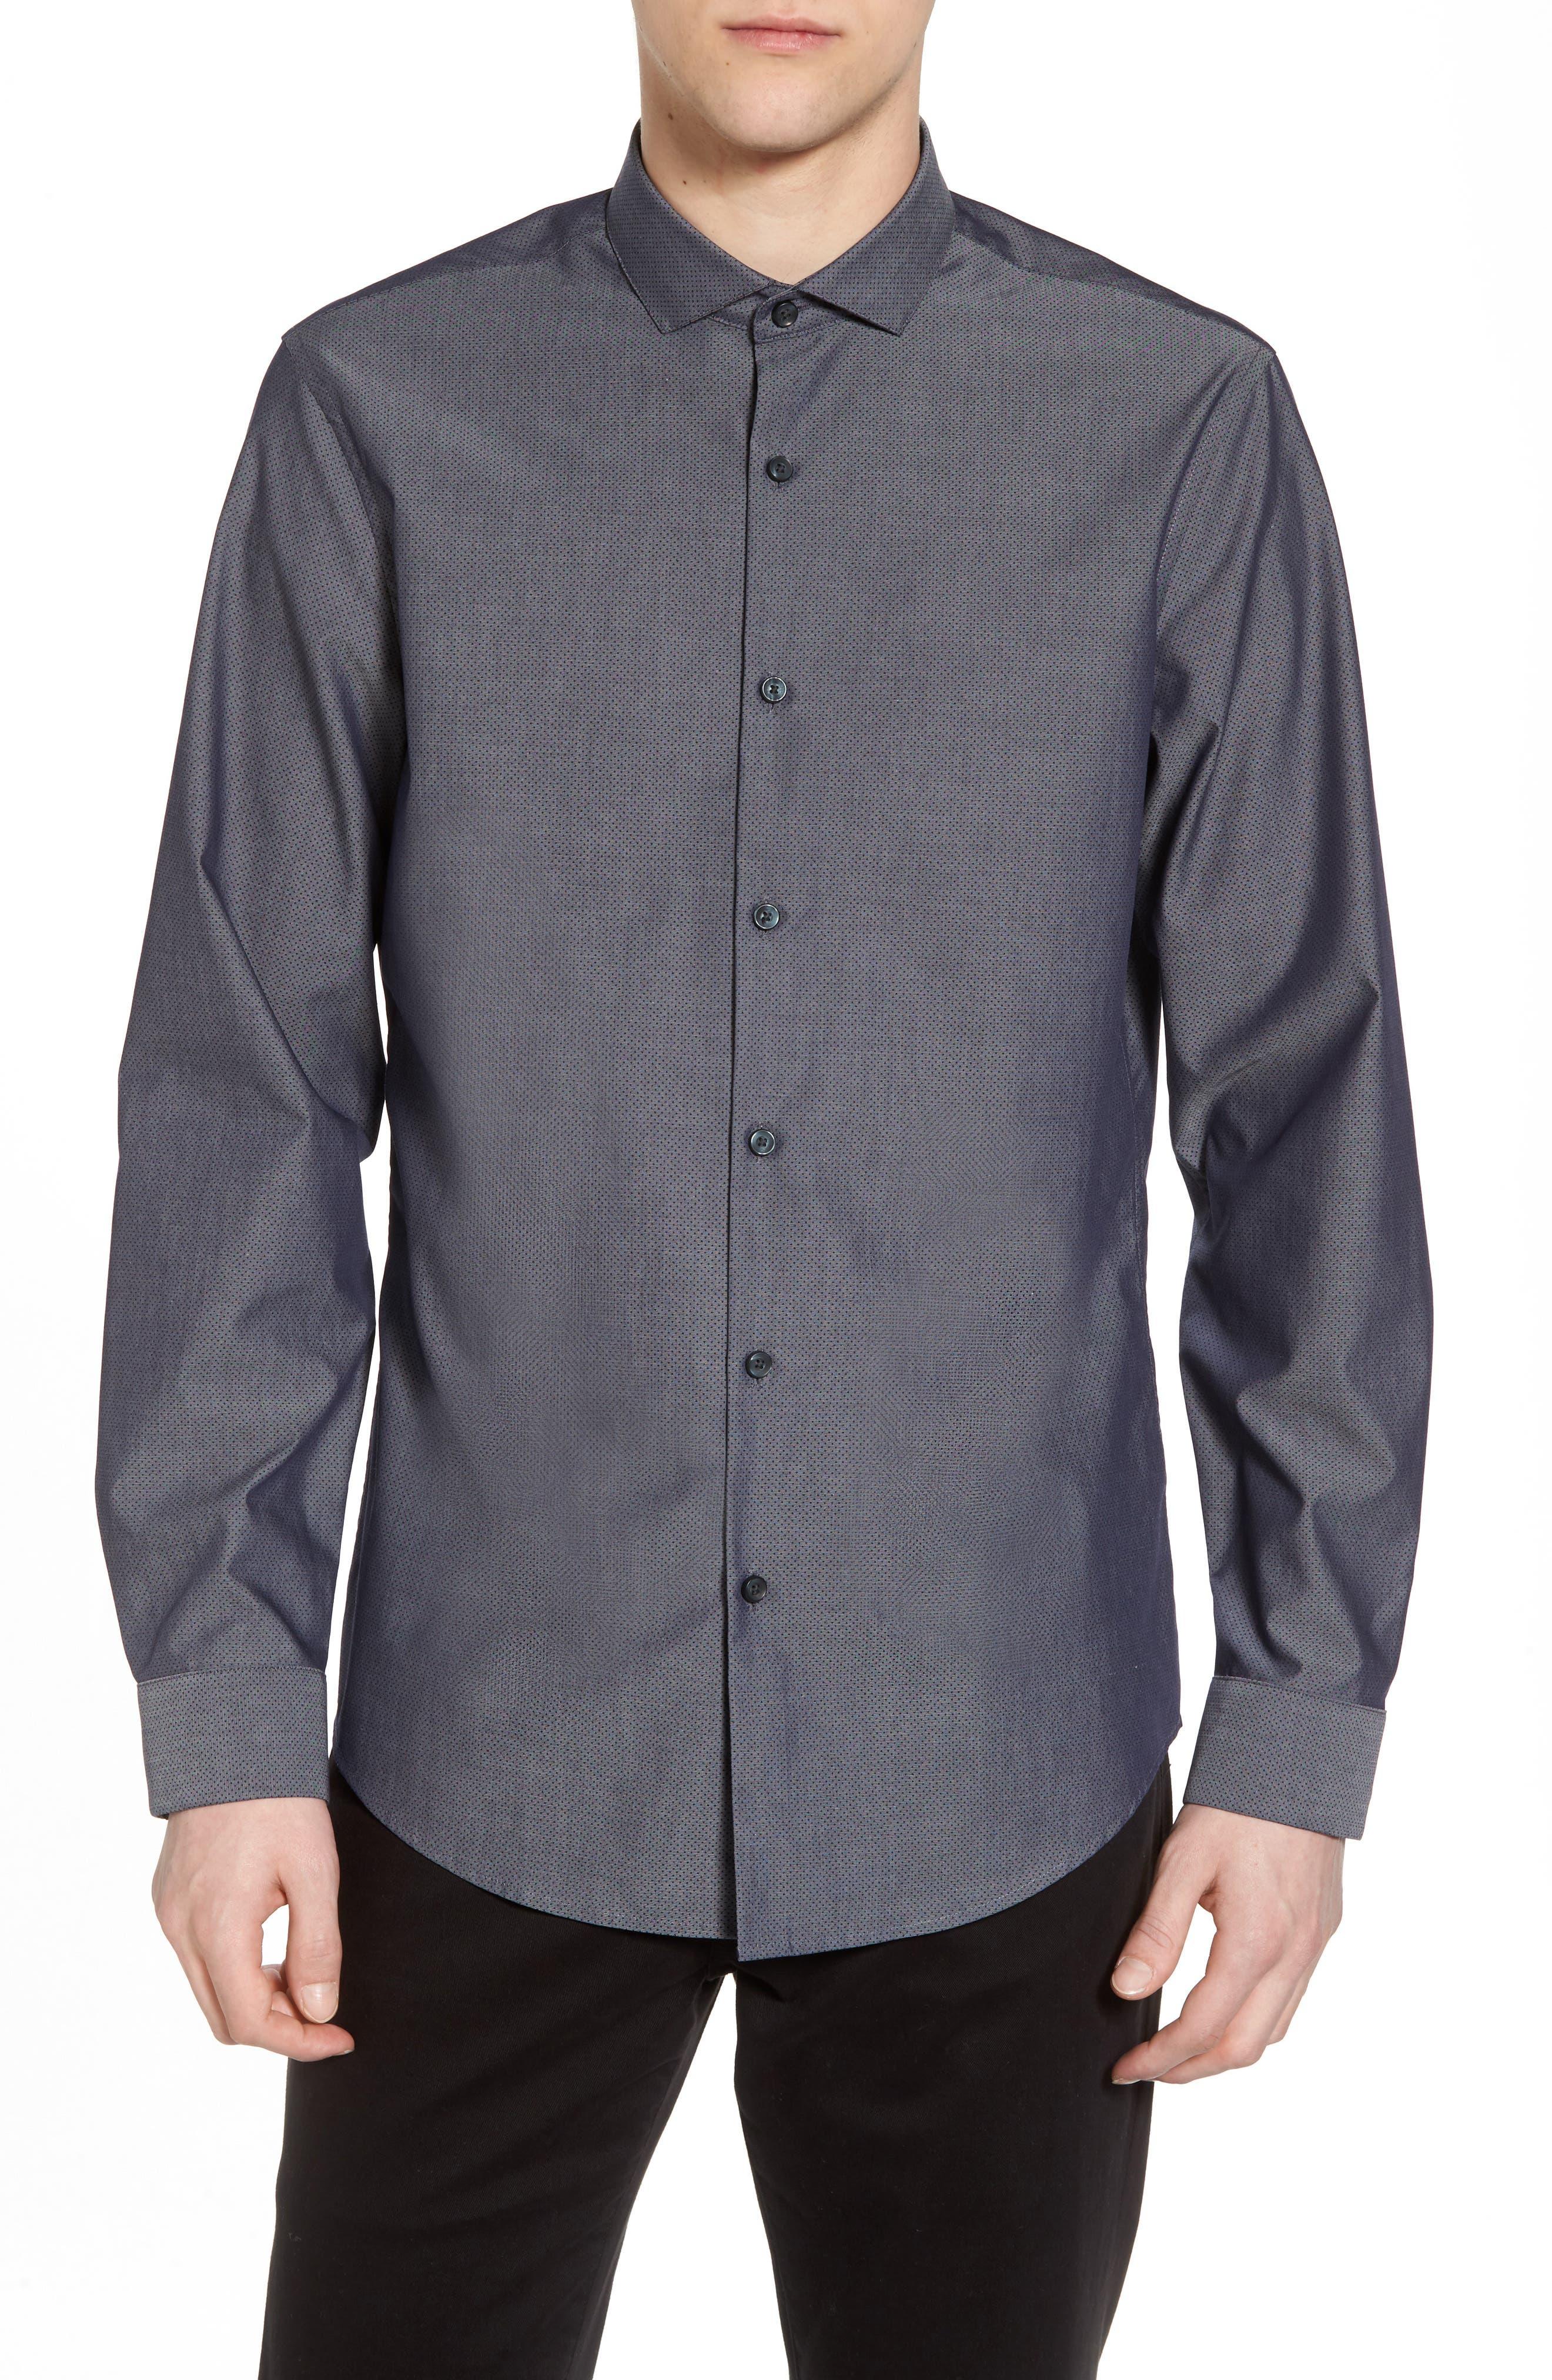 Alternate Image 1 Selected - Calibrate Slim Fit Solid Sport Shirt